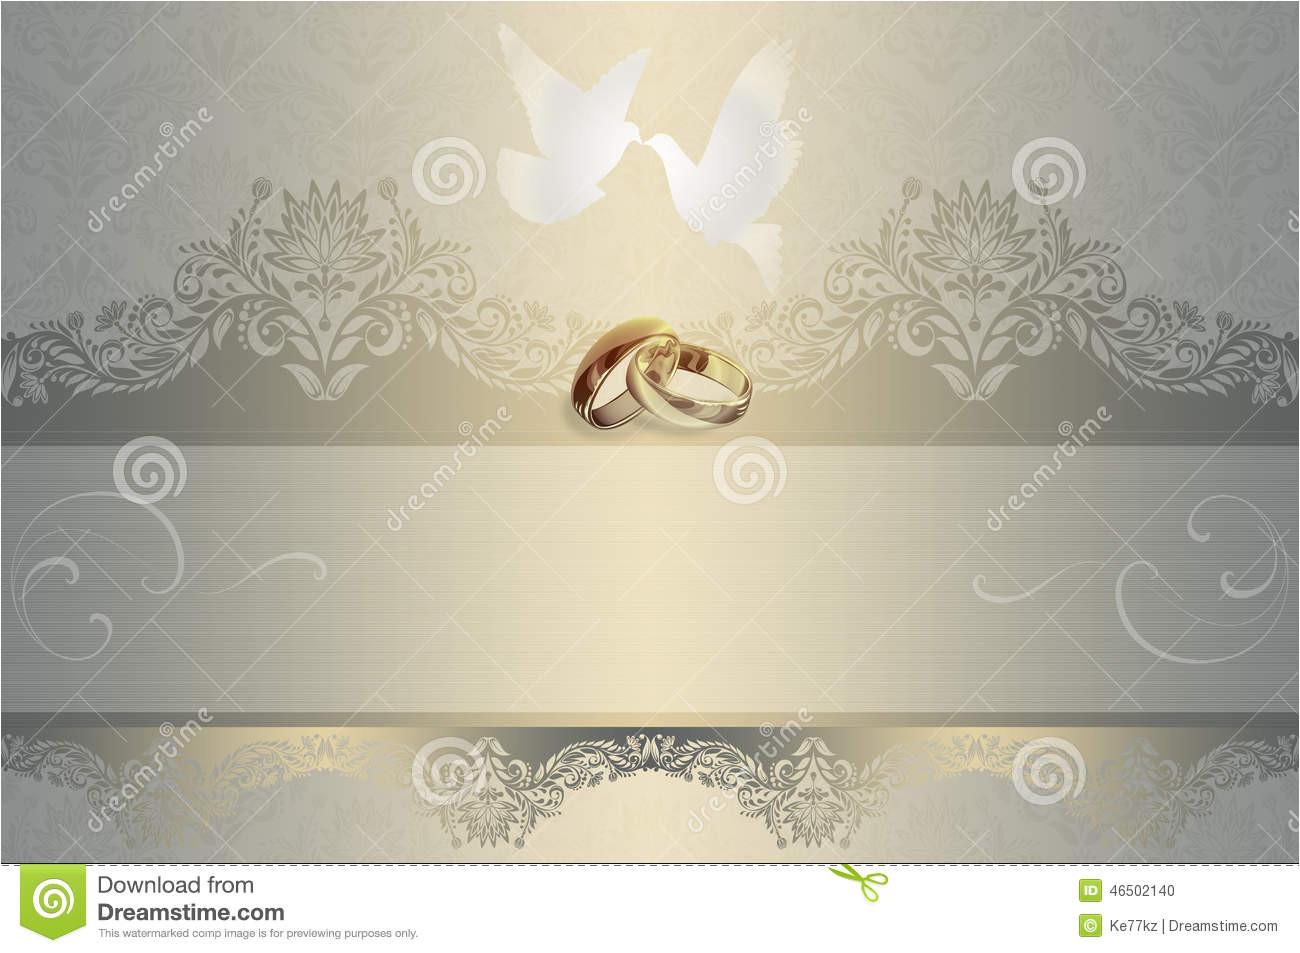 stock illustration wedding invitation template card white doves gold rings image46502140